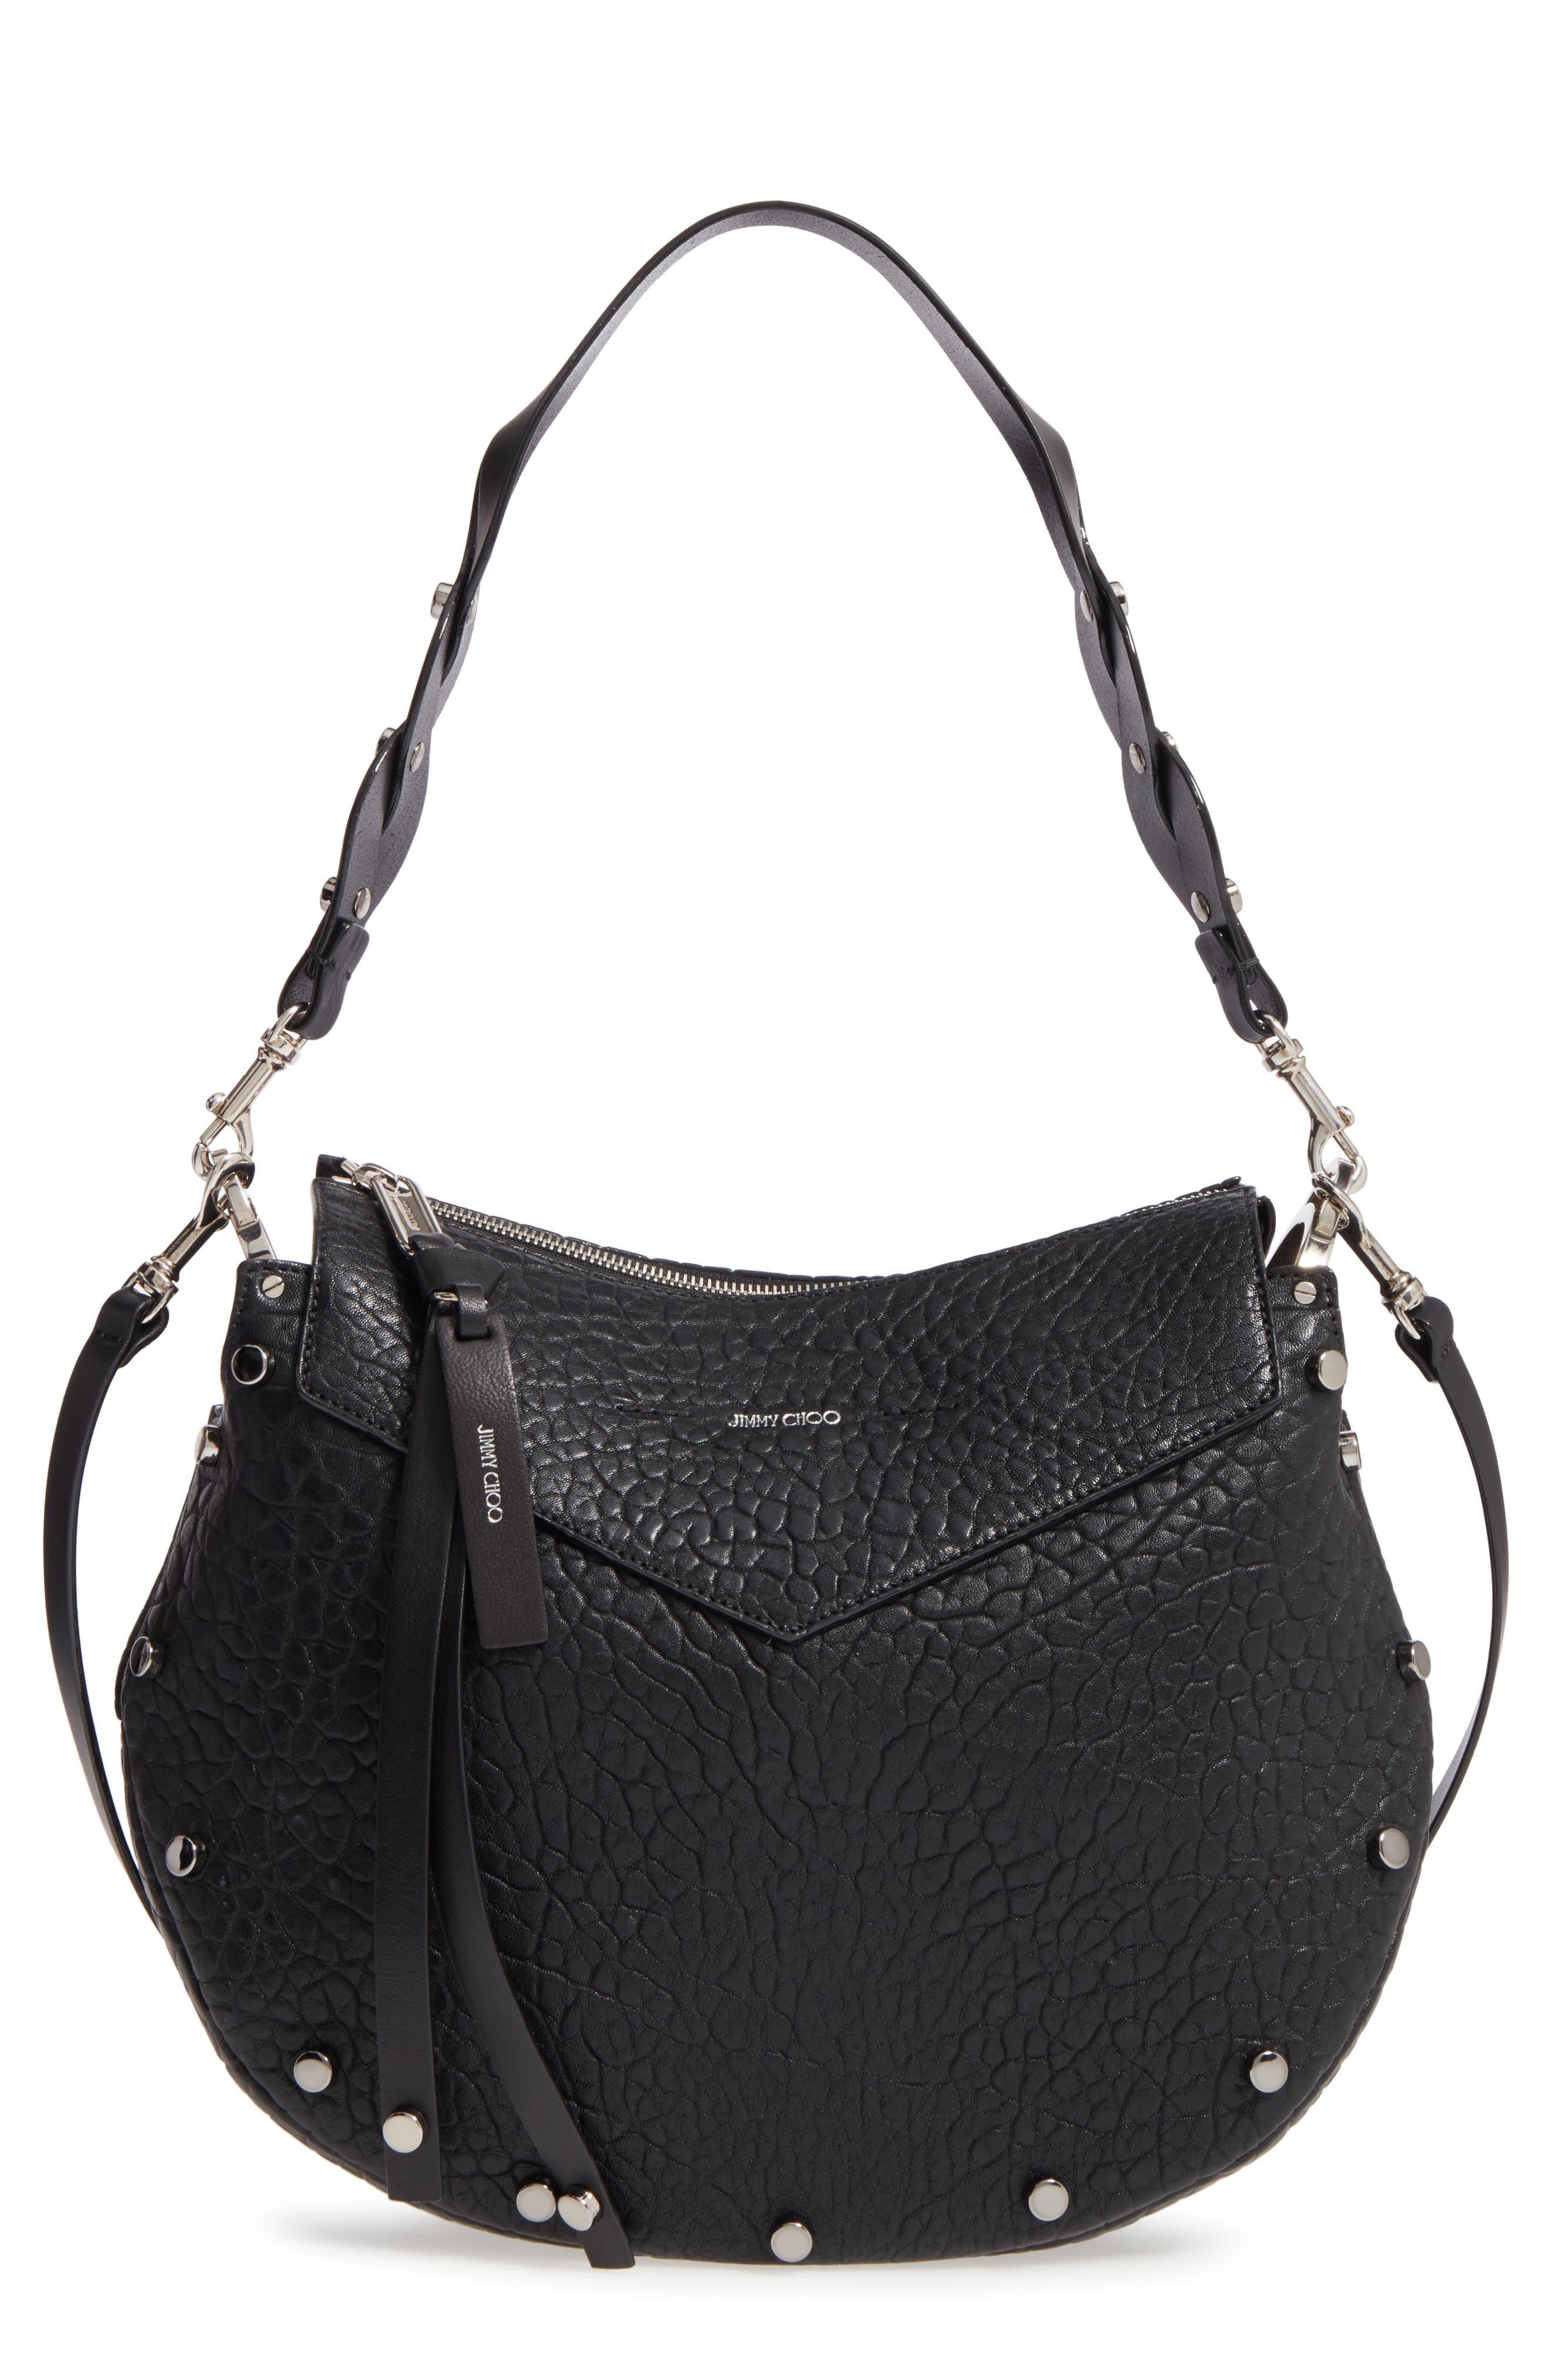 Alternate Image 1 Selected - Jimmy Choo Artie Studded Leather Hobo Bag